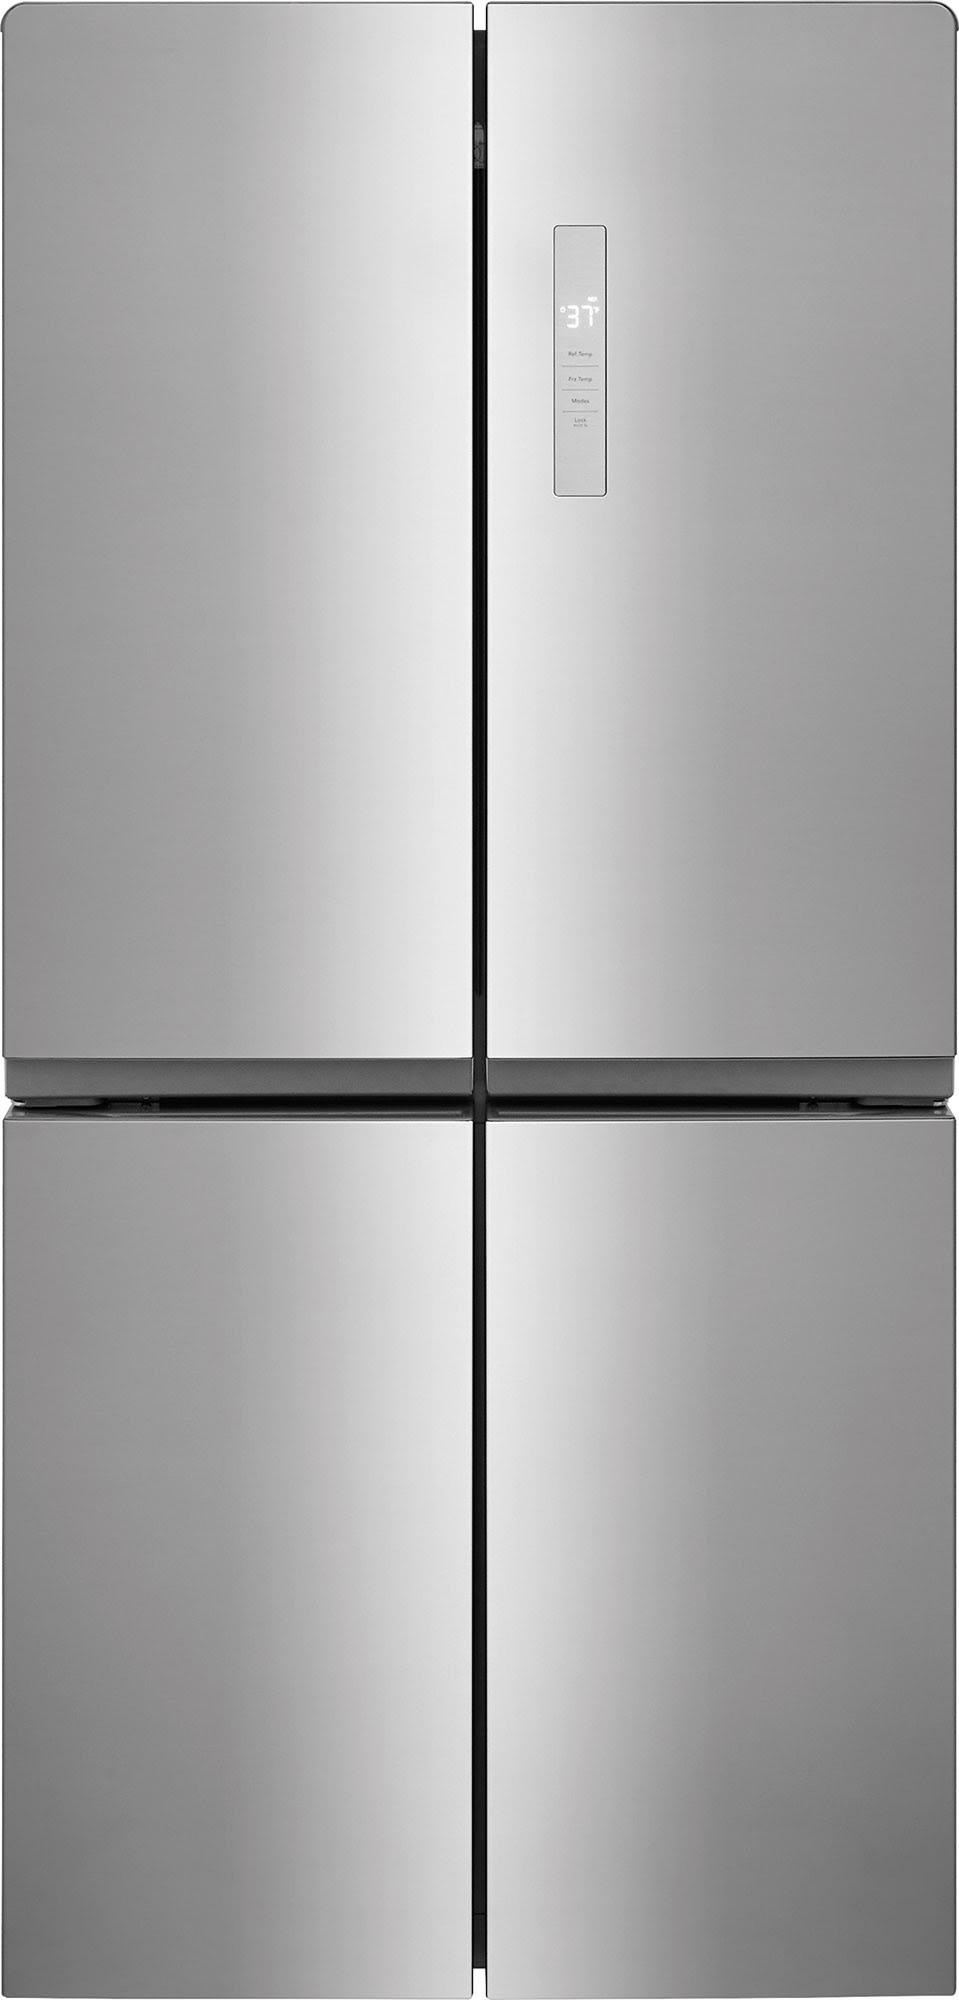 "Frigidaire 17.4 cu. ft. 4 Door French Door Counter Depth Refrigerator, Brushed Steel (33"" W x 29 1/8"" D) $689 AR + Free Shipping"